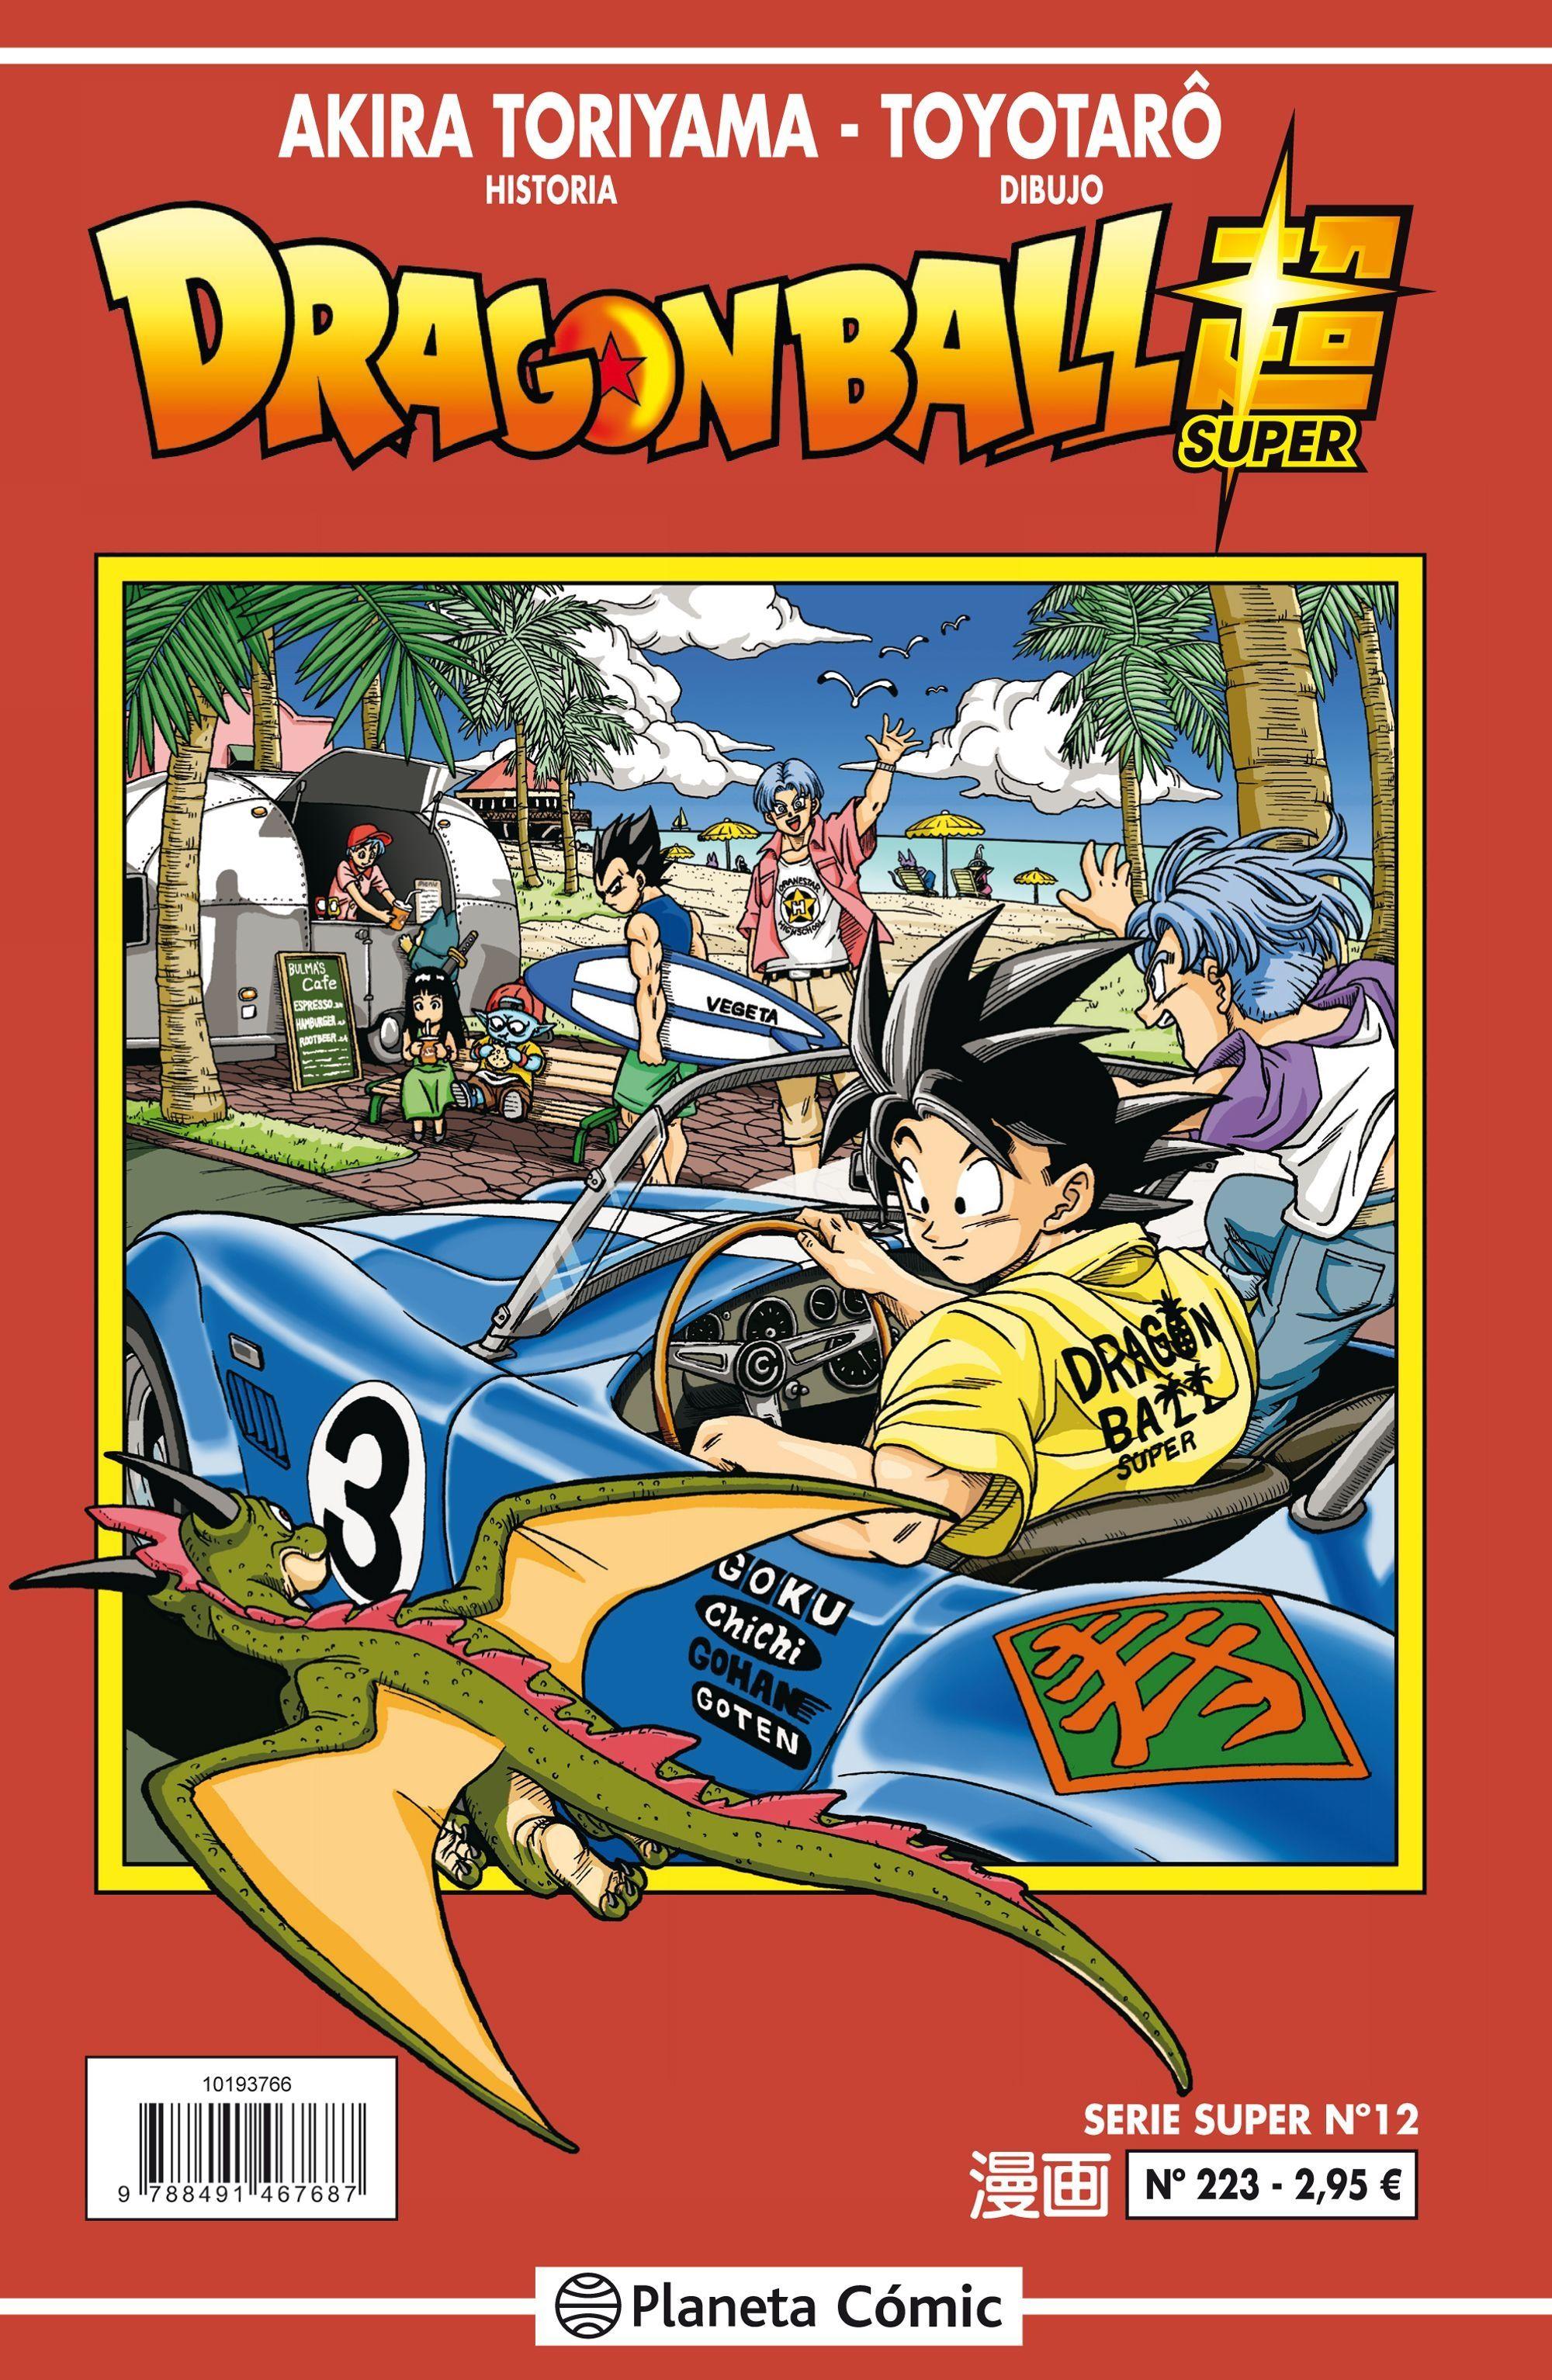 Dragon ball serie roja manga   Akira, Dragones y Dragon ball